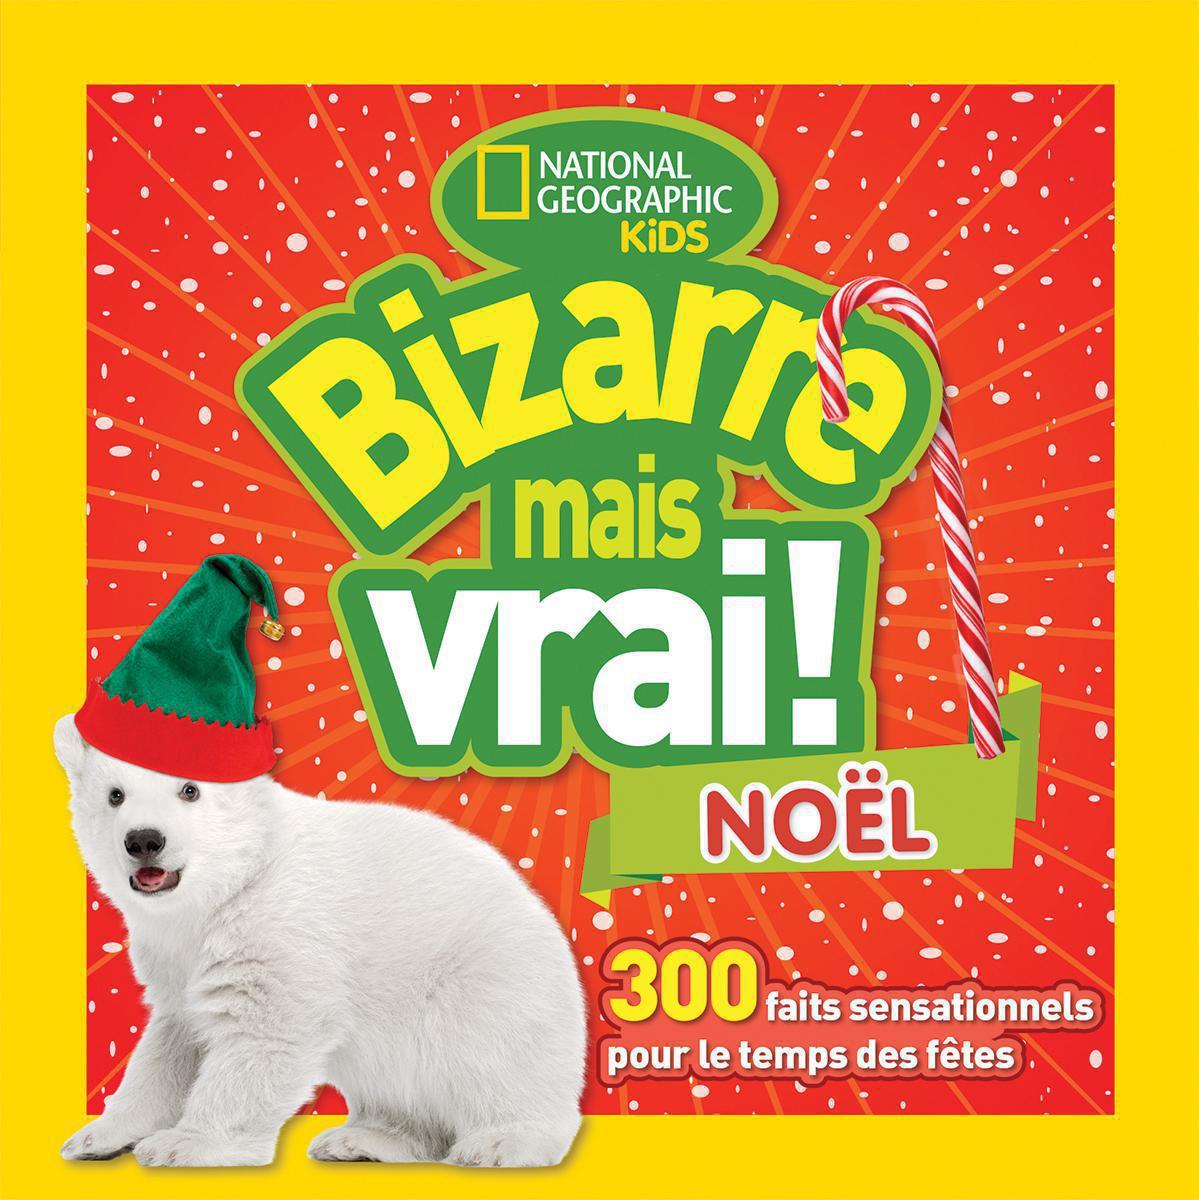 Ensemble National Geographic Kids® Bizarre mais vrai! Noël